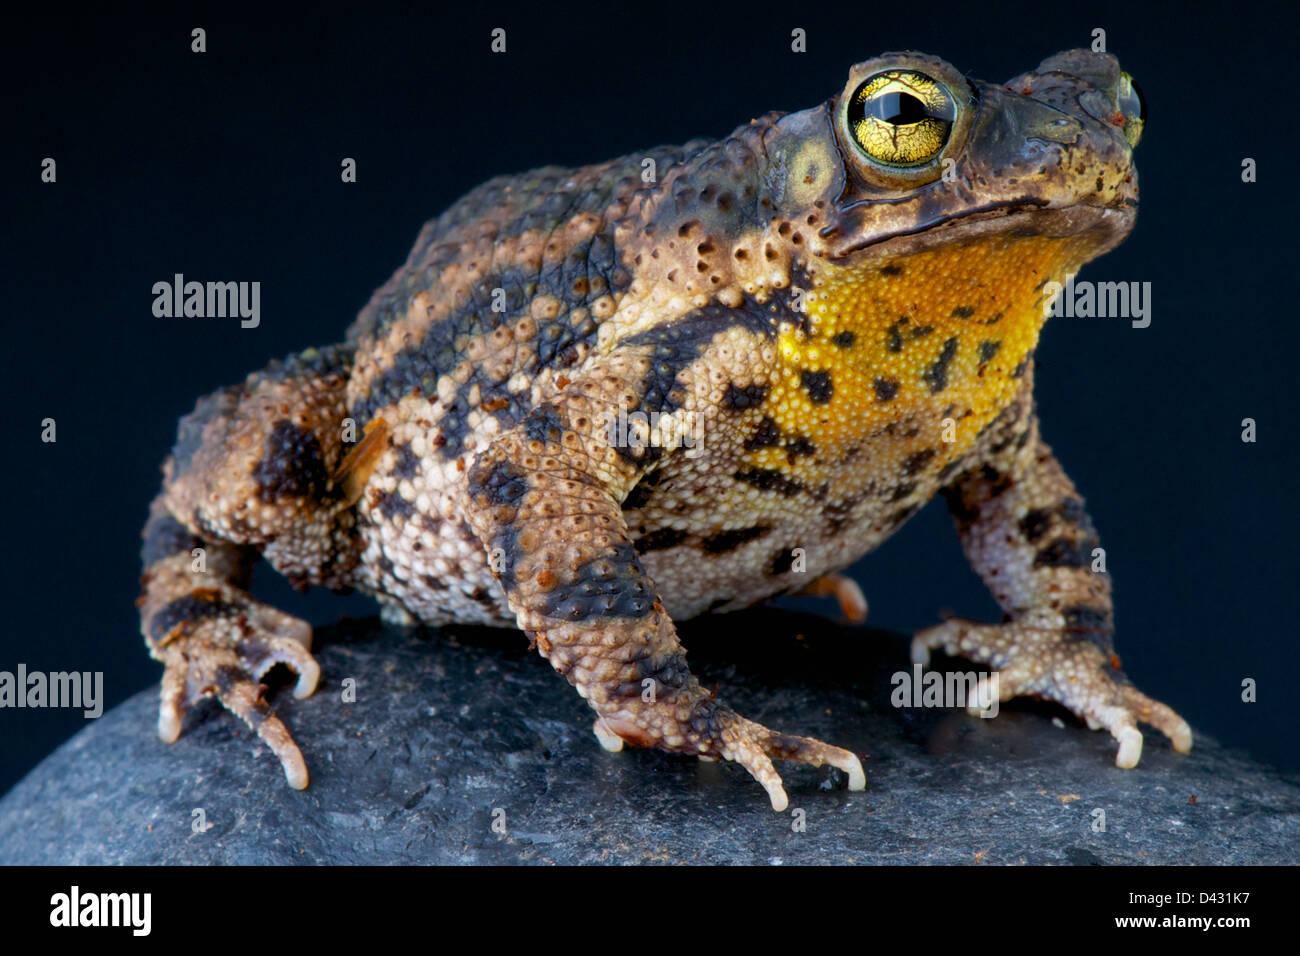 Warty toad / Rhinella granulosa - Stock Image